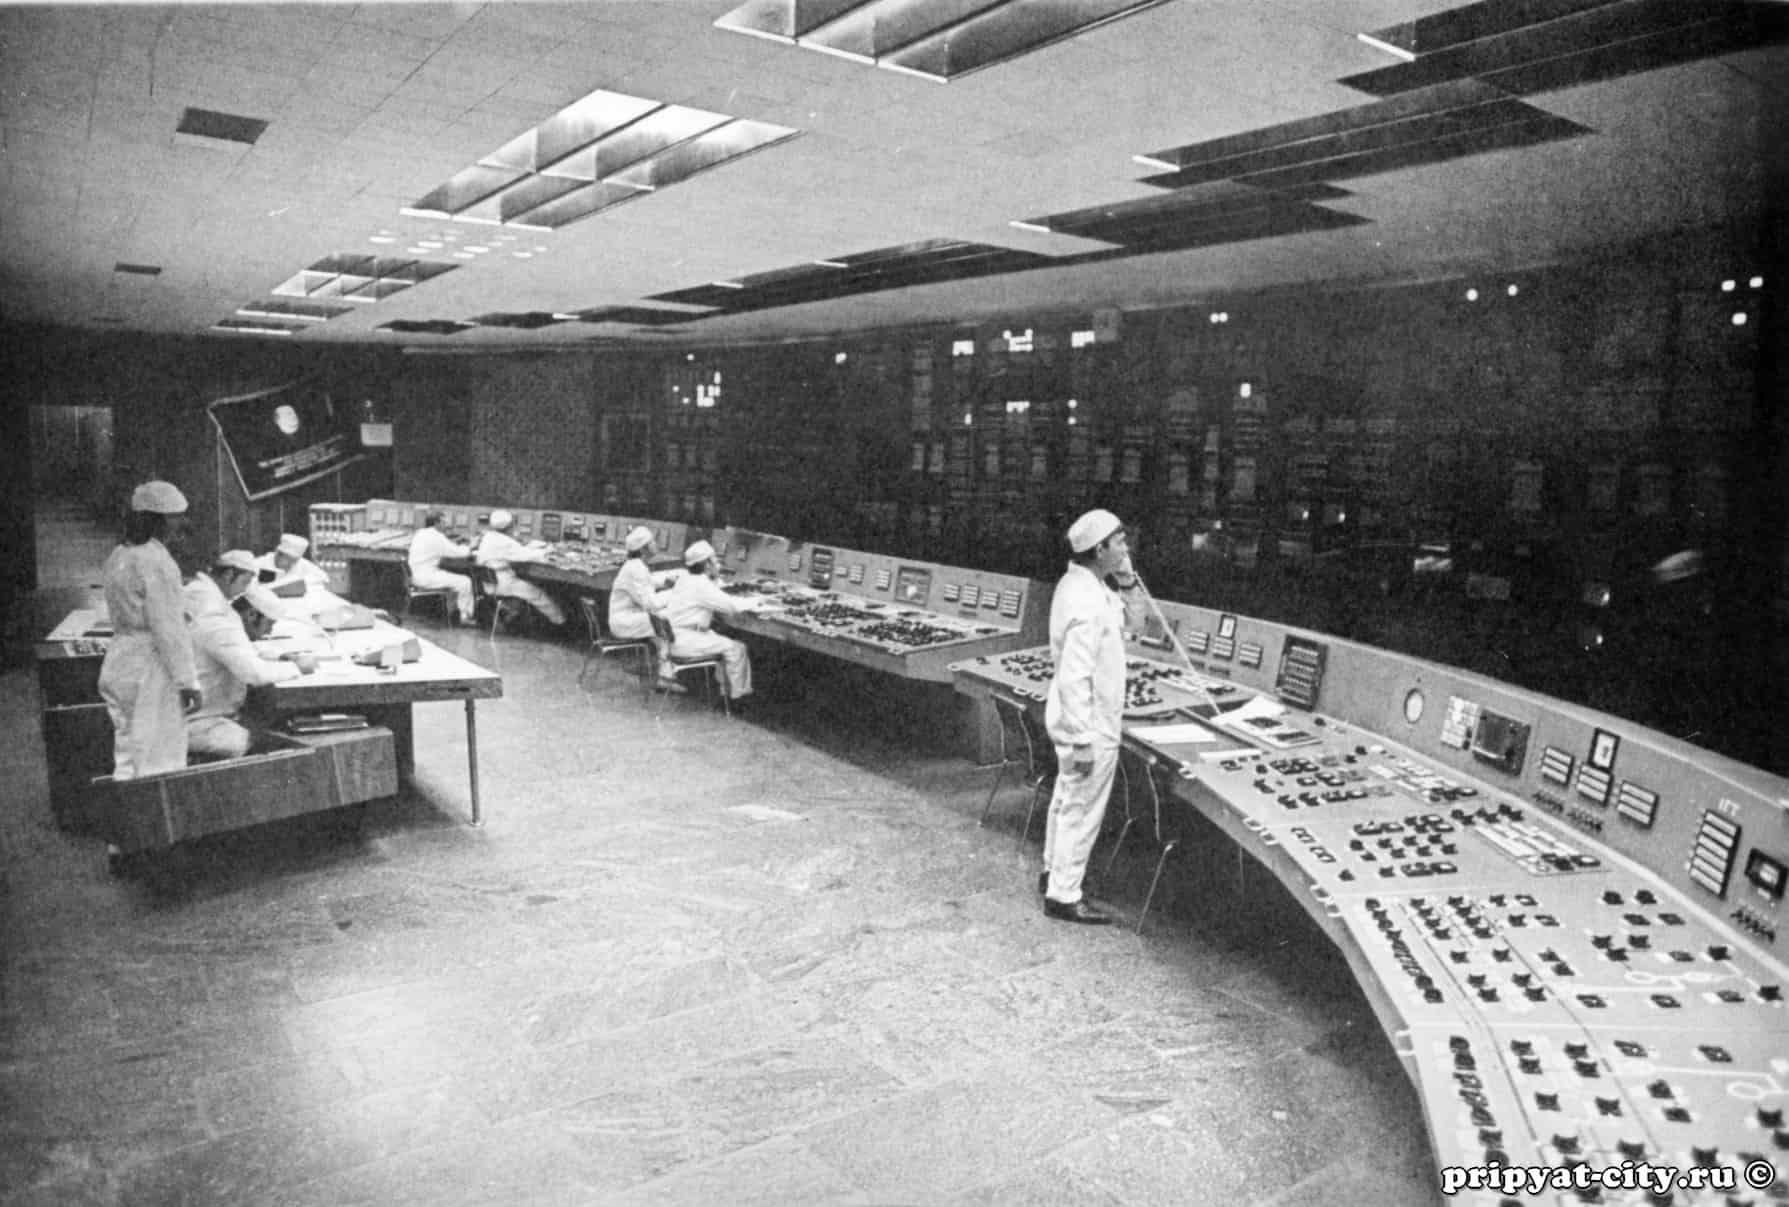 Foto vere control room chernobyl